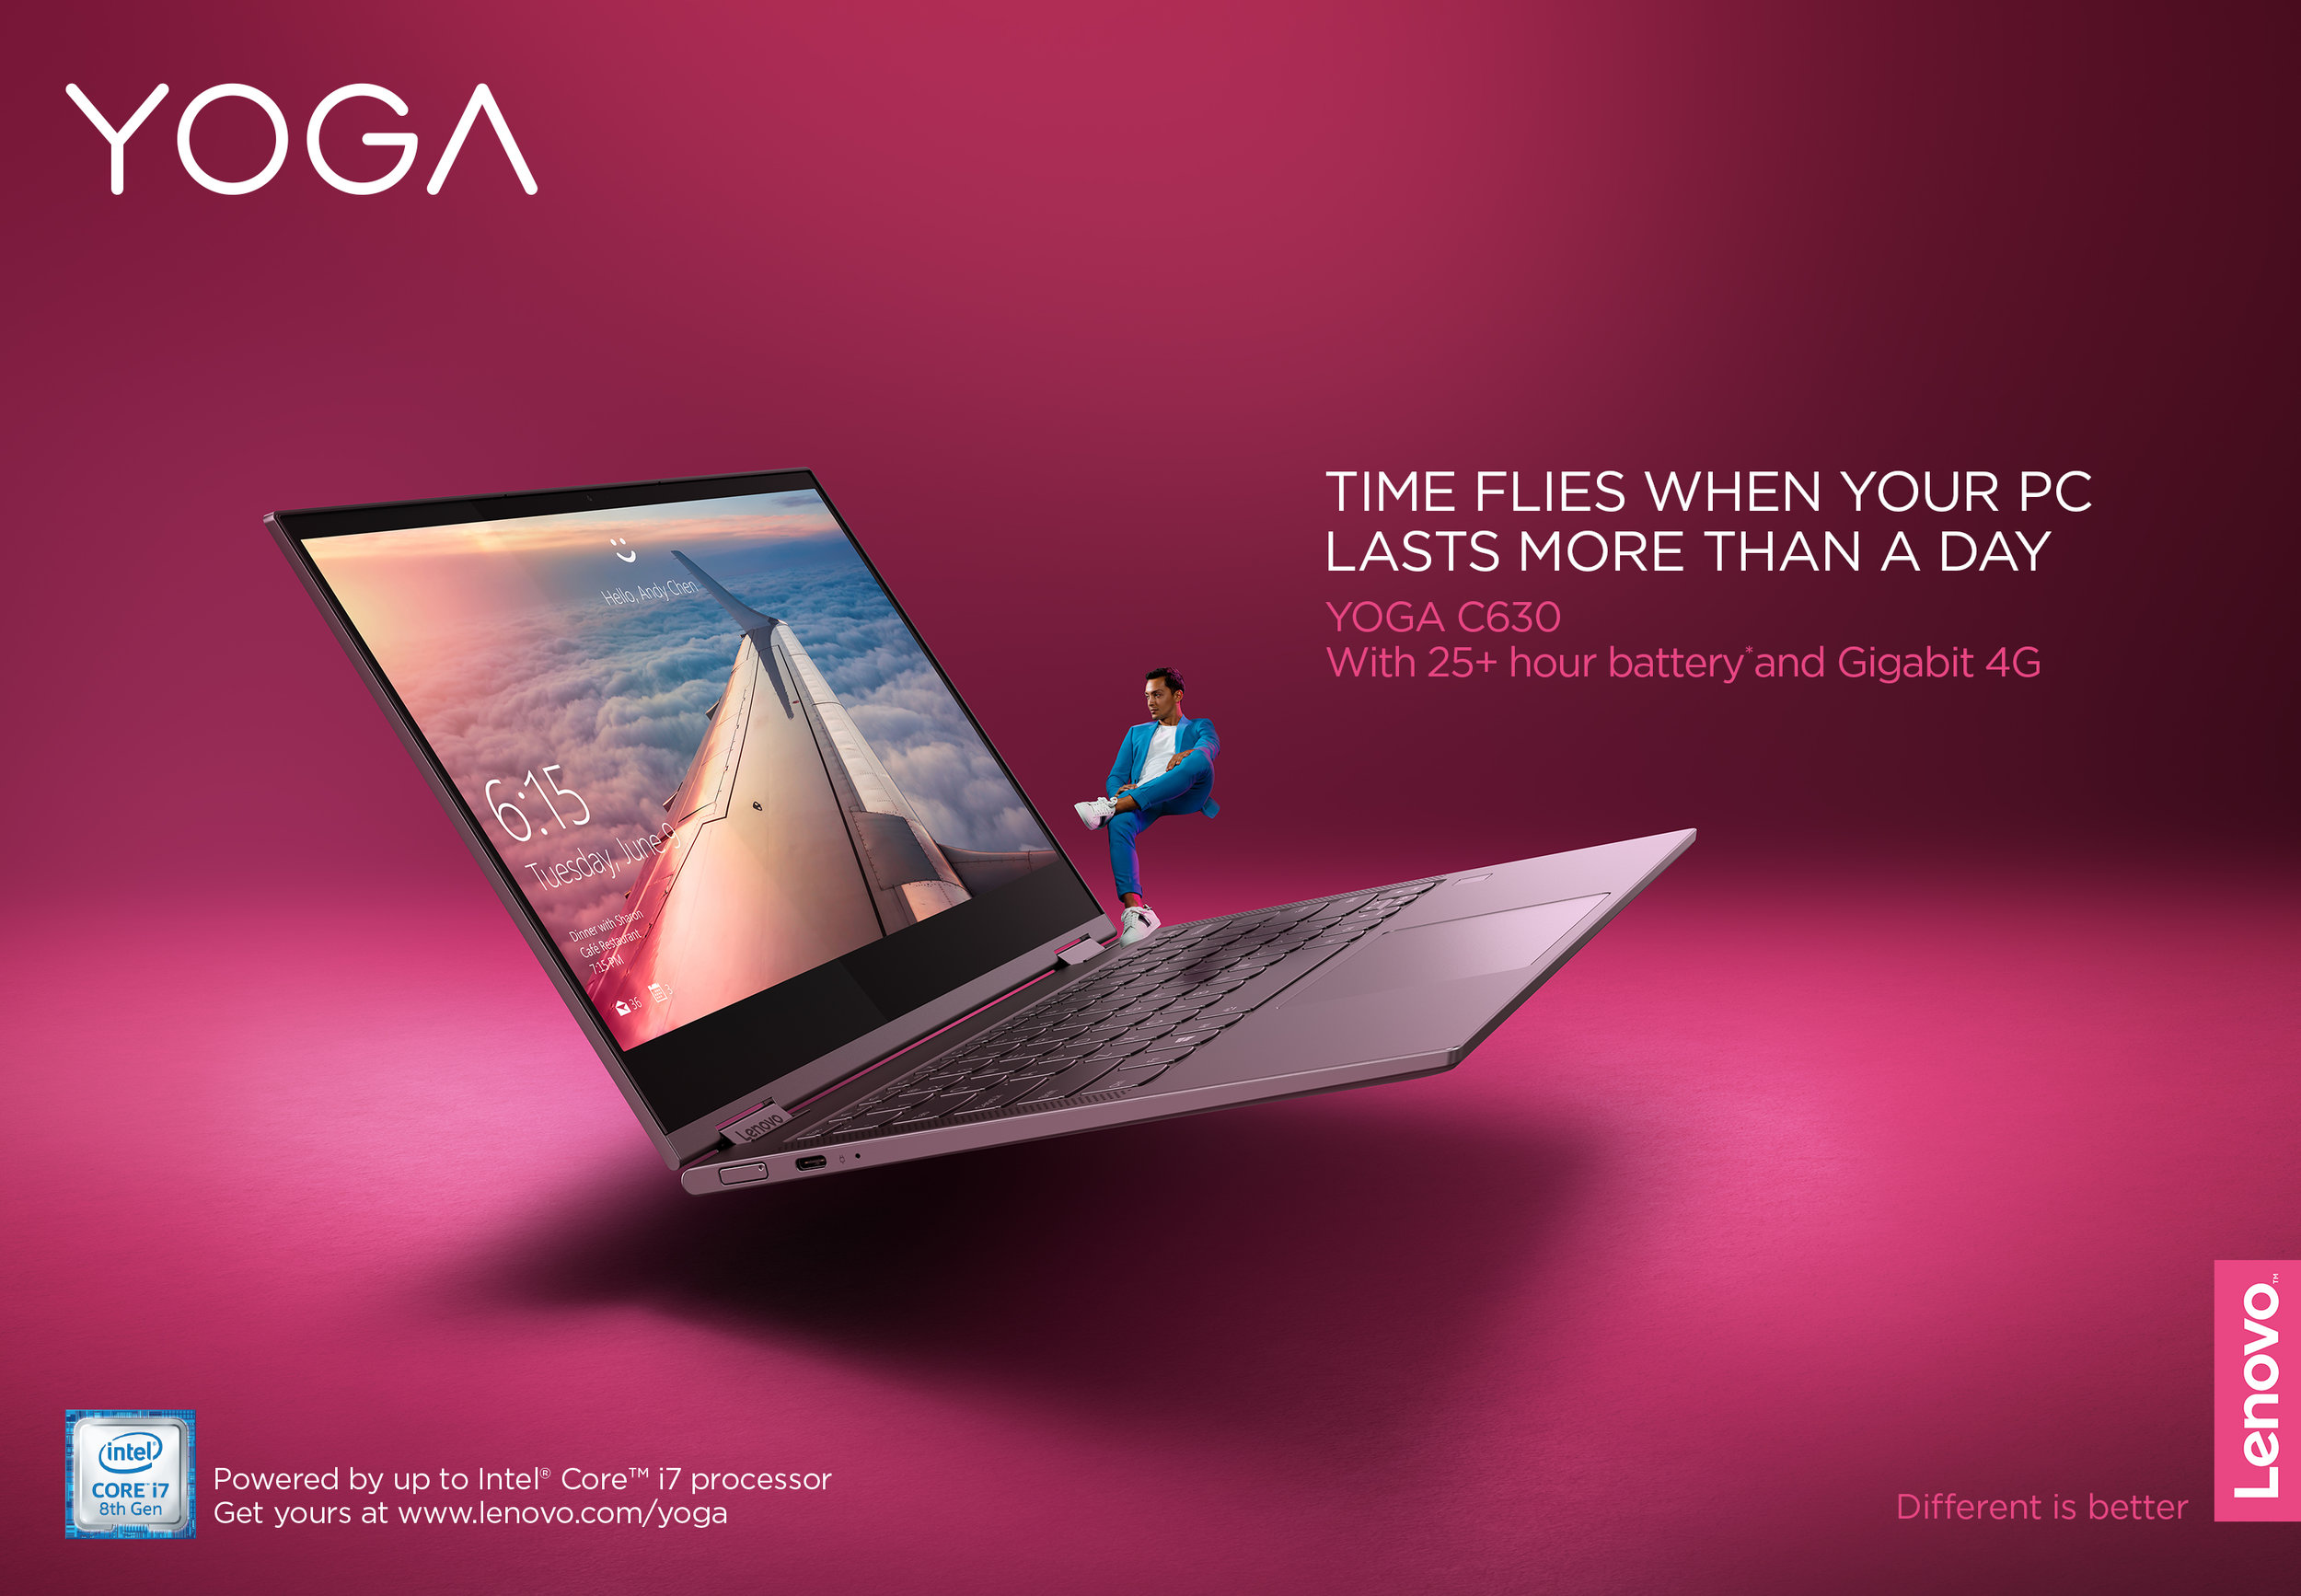 Yoga-C630.jpg